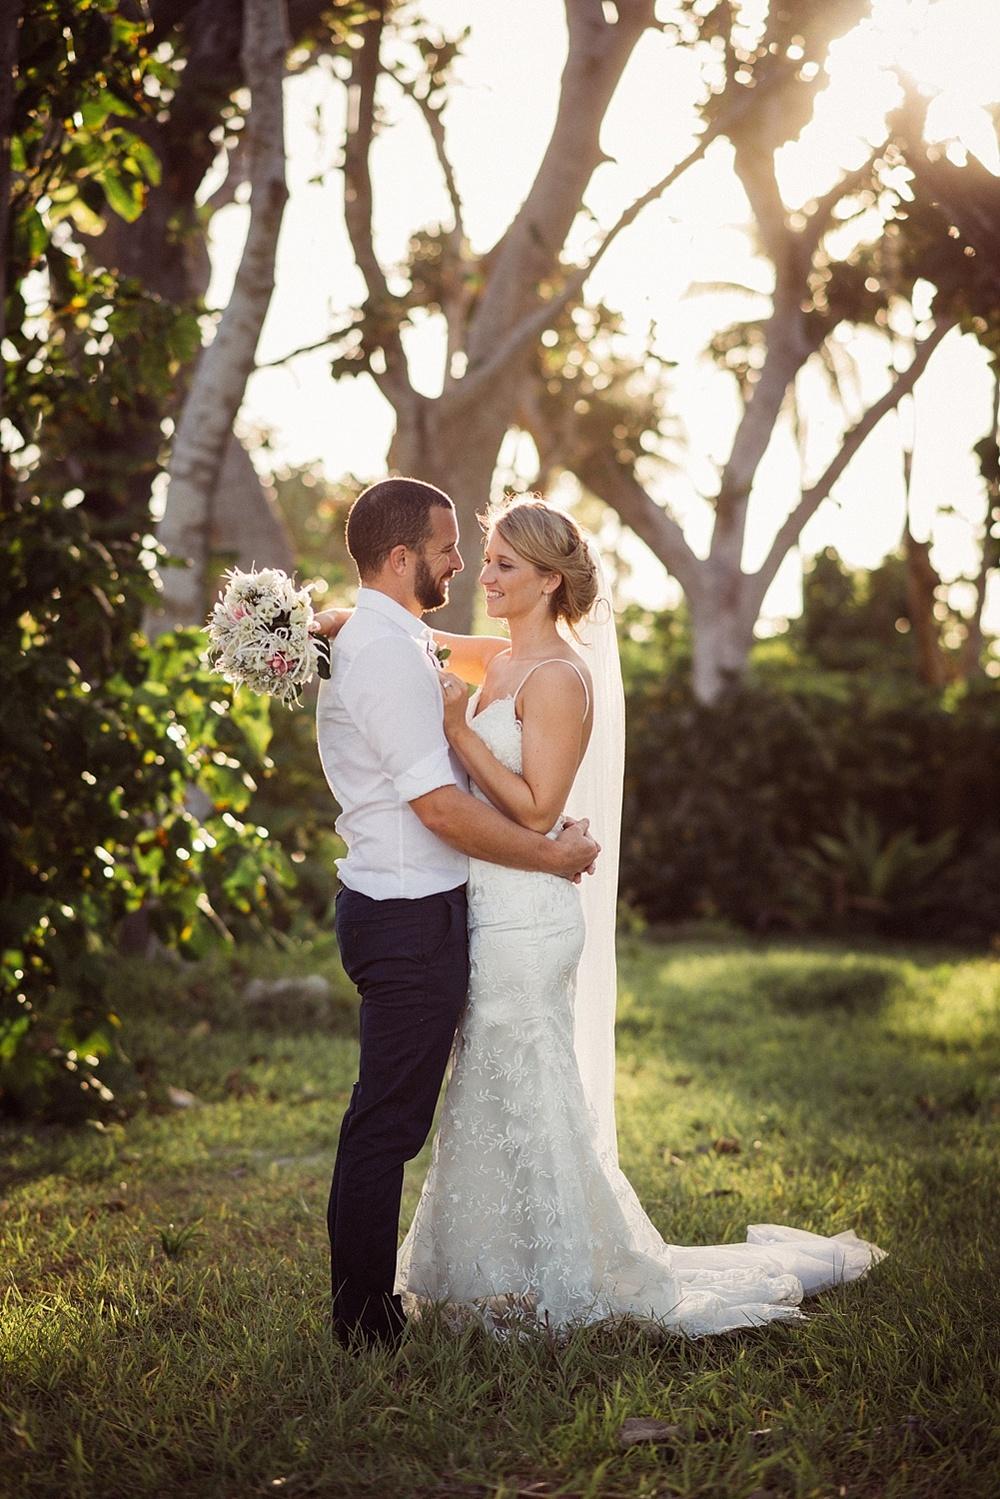 Jess&Luke-wedding-Vanuatu-Groovy-Banana_0036.jpg